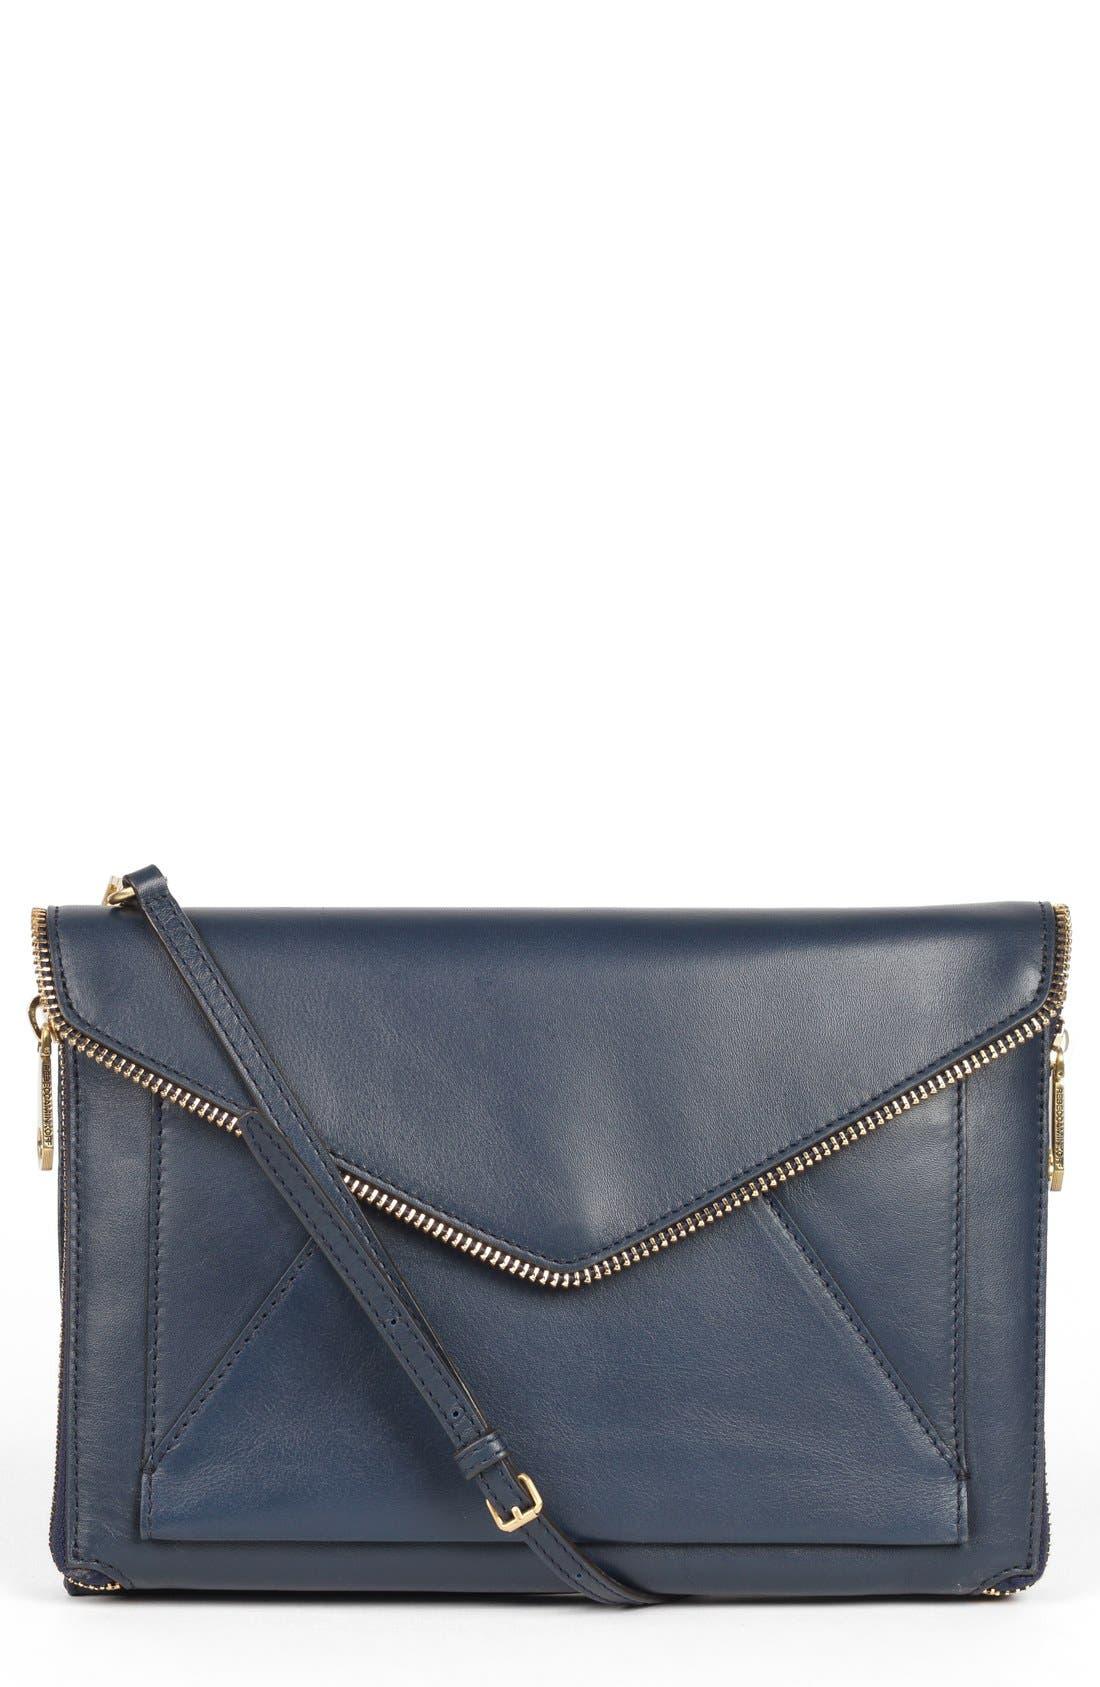 Main Image - Rebecca Minkoff 'Marlow' Bag